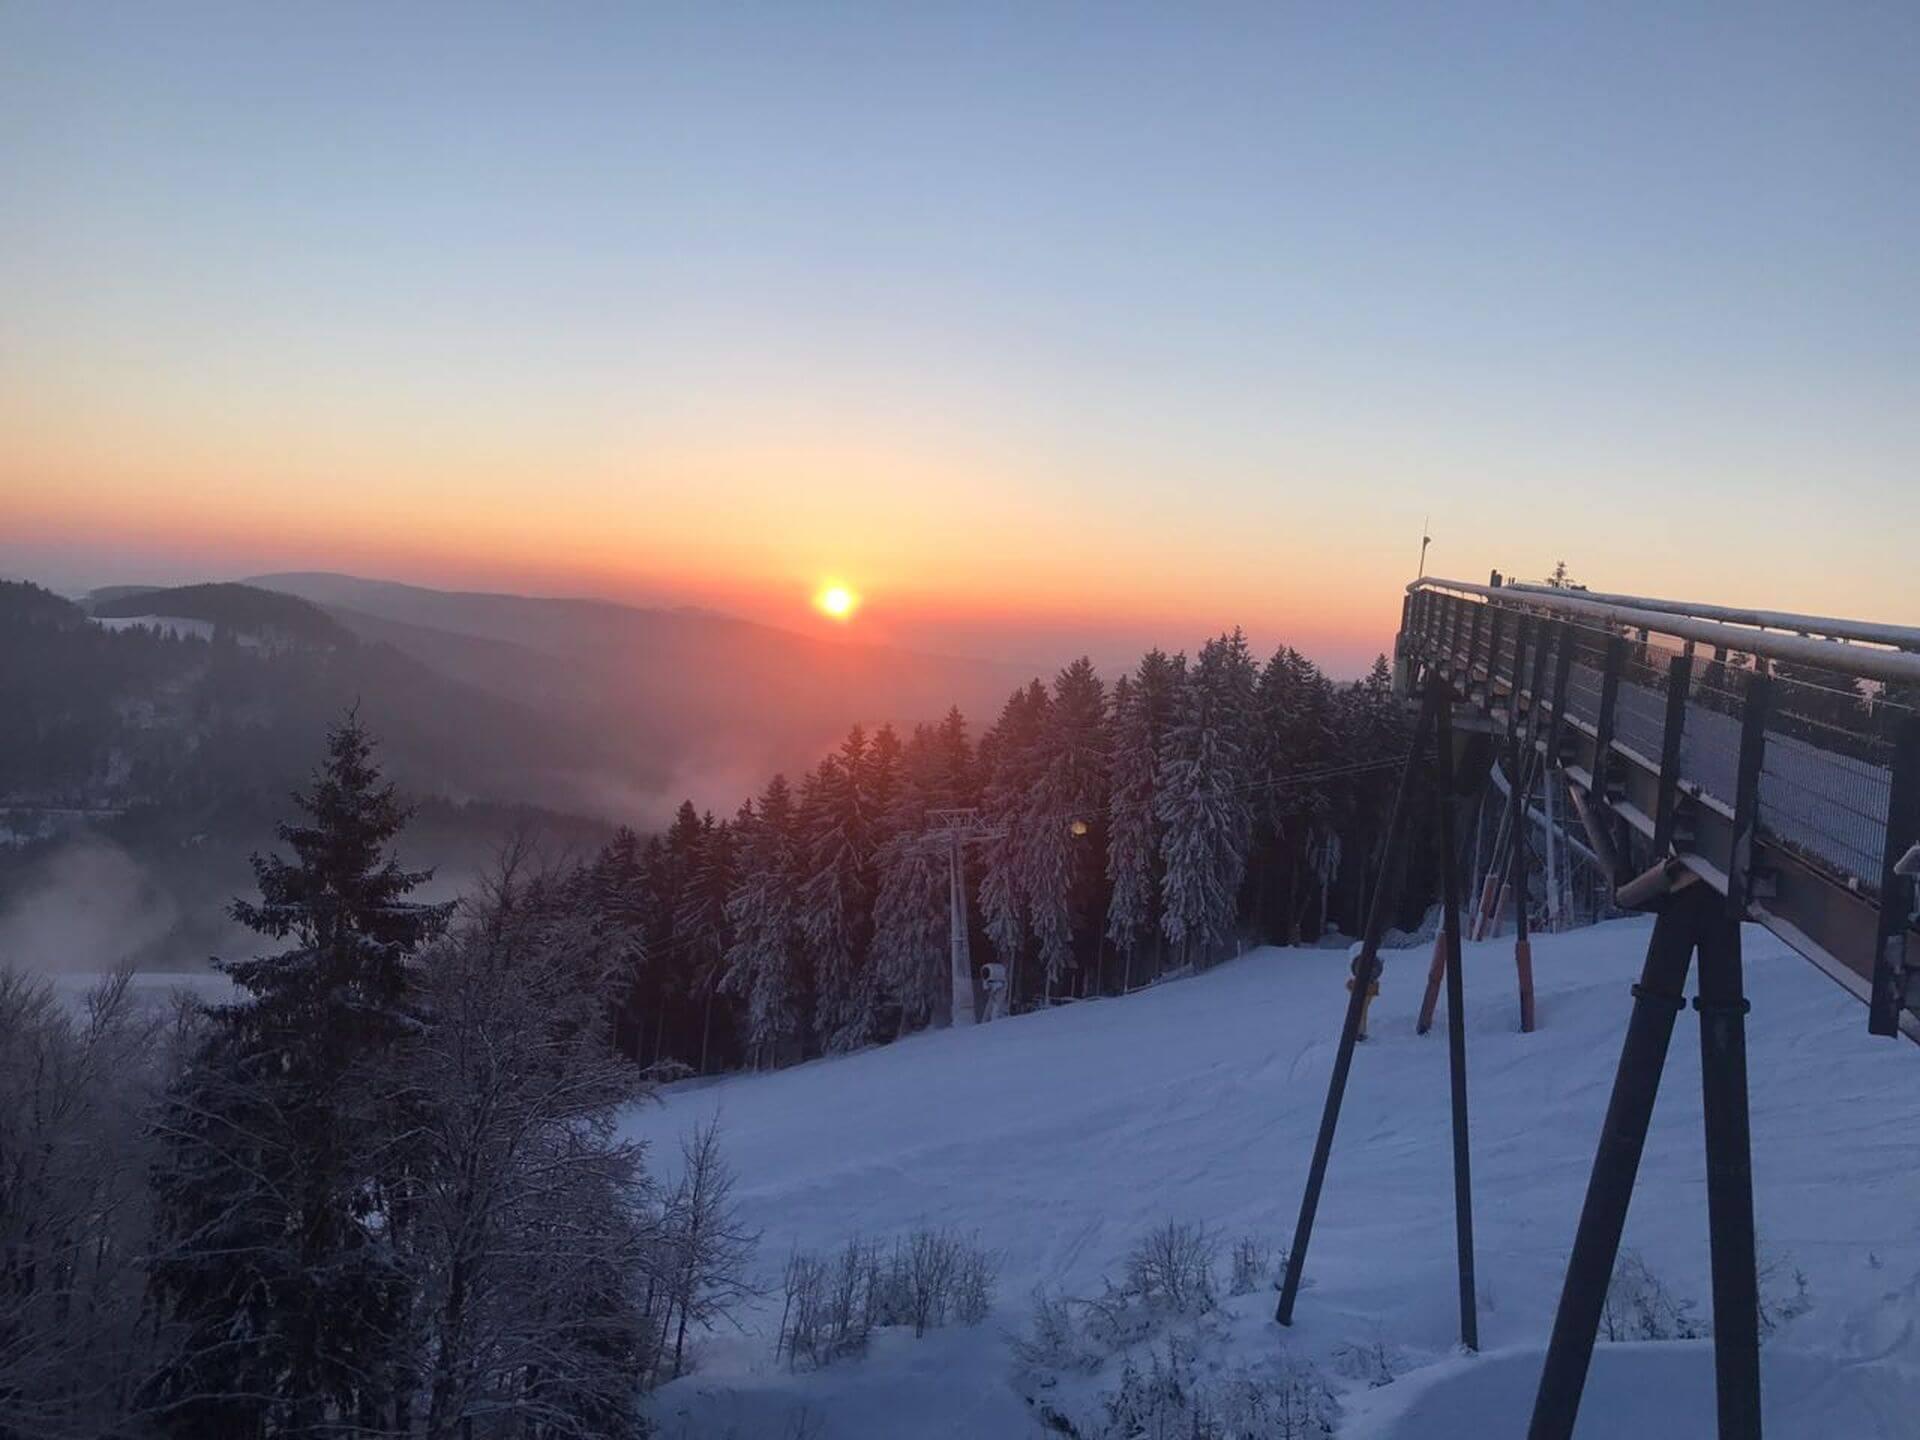 Sonnenaufgang an der Panorama Erlebnis Brücke Winterberg